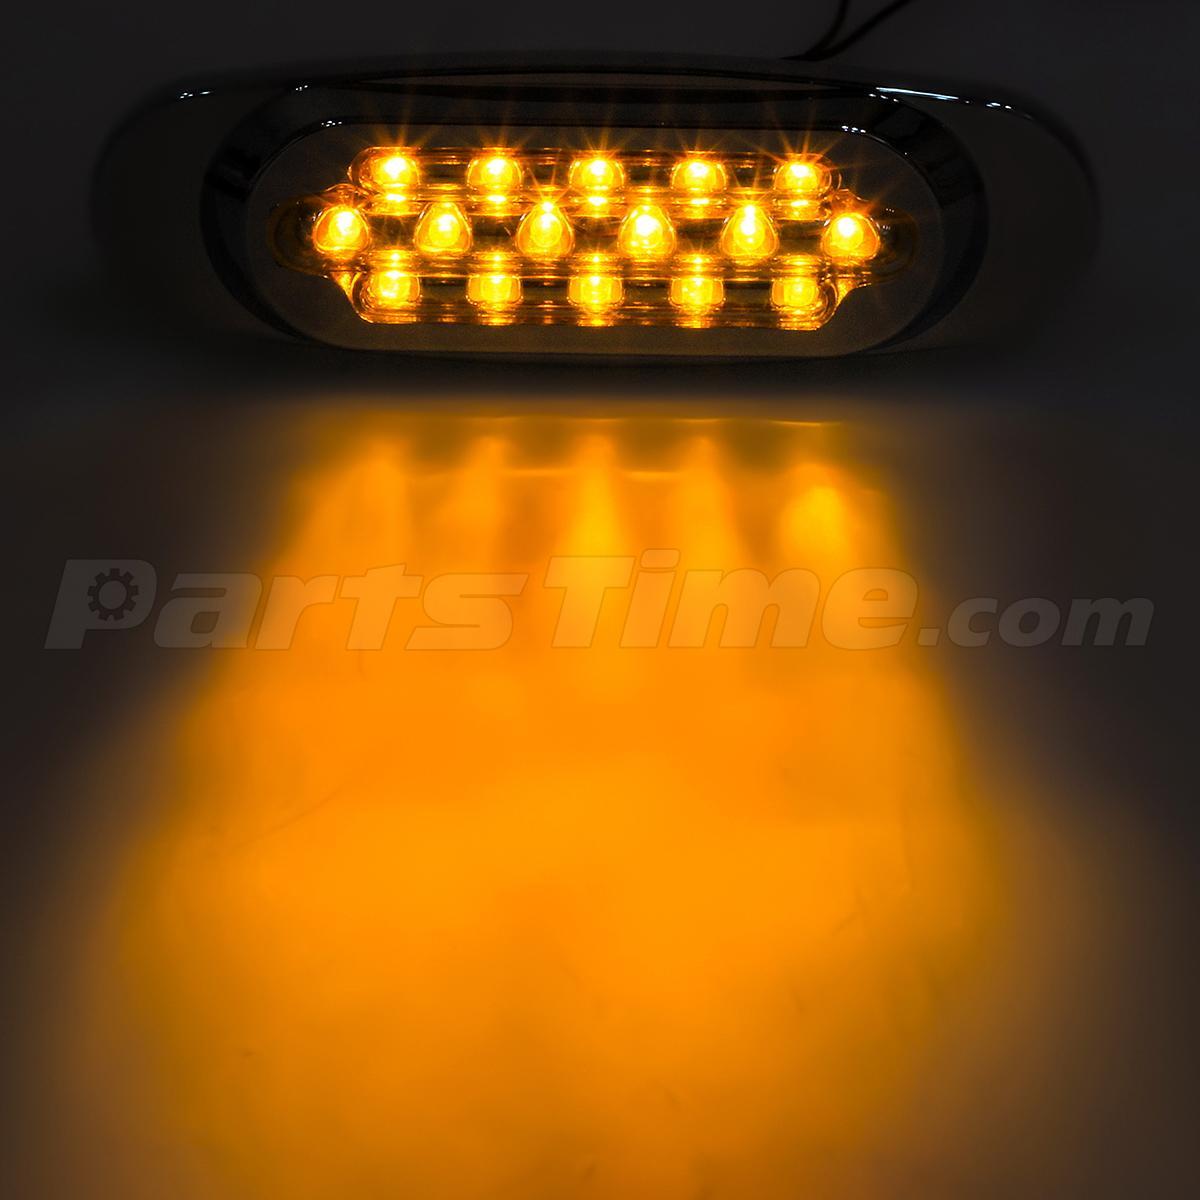 fuse panel questions 165160 11 p a2v5bglmzq 2009 kenworth w900 headlight  [ 1200 x 1200 Pixel ]